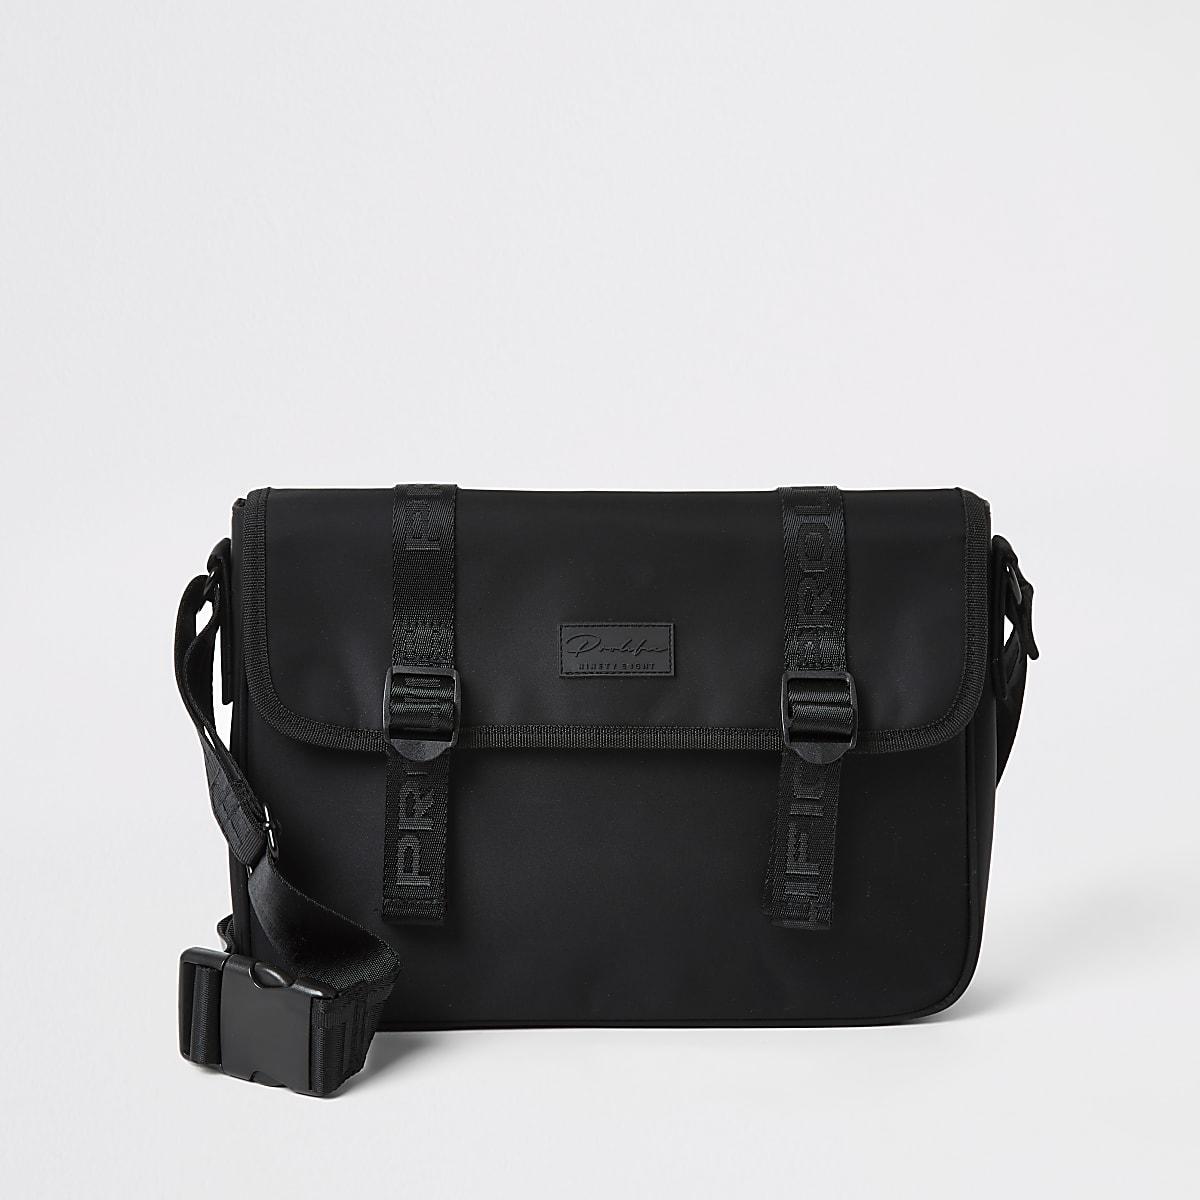 Black Prolific tape flapover satchel bag